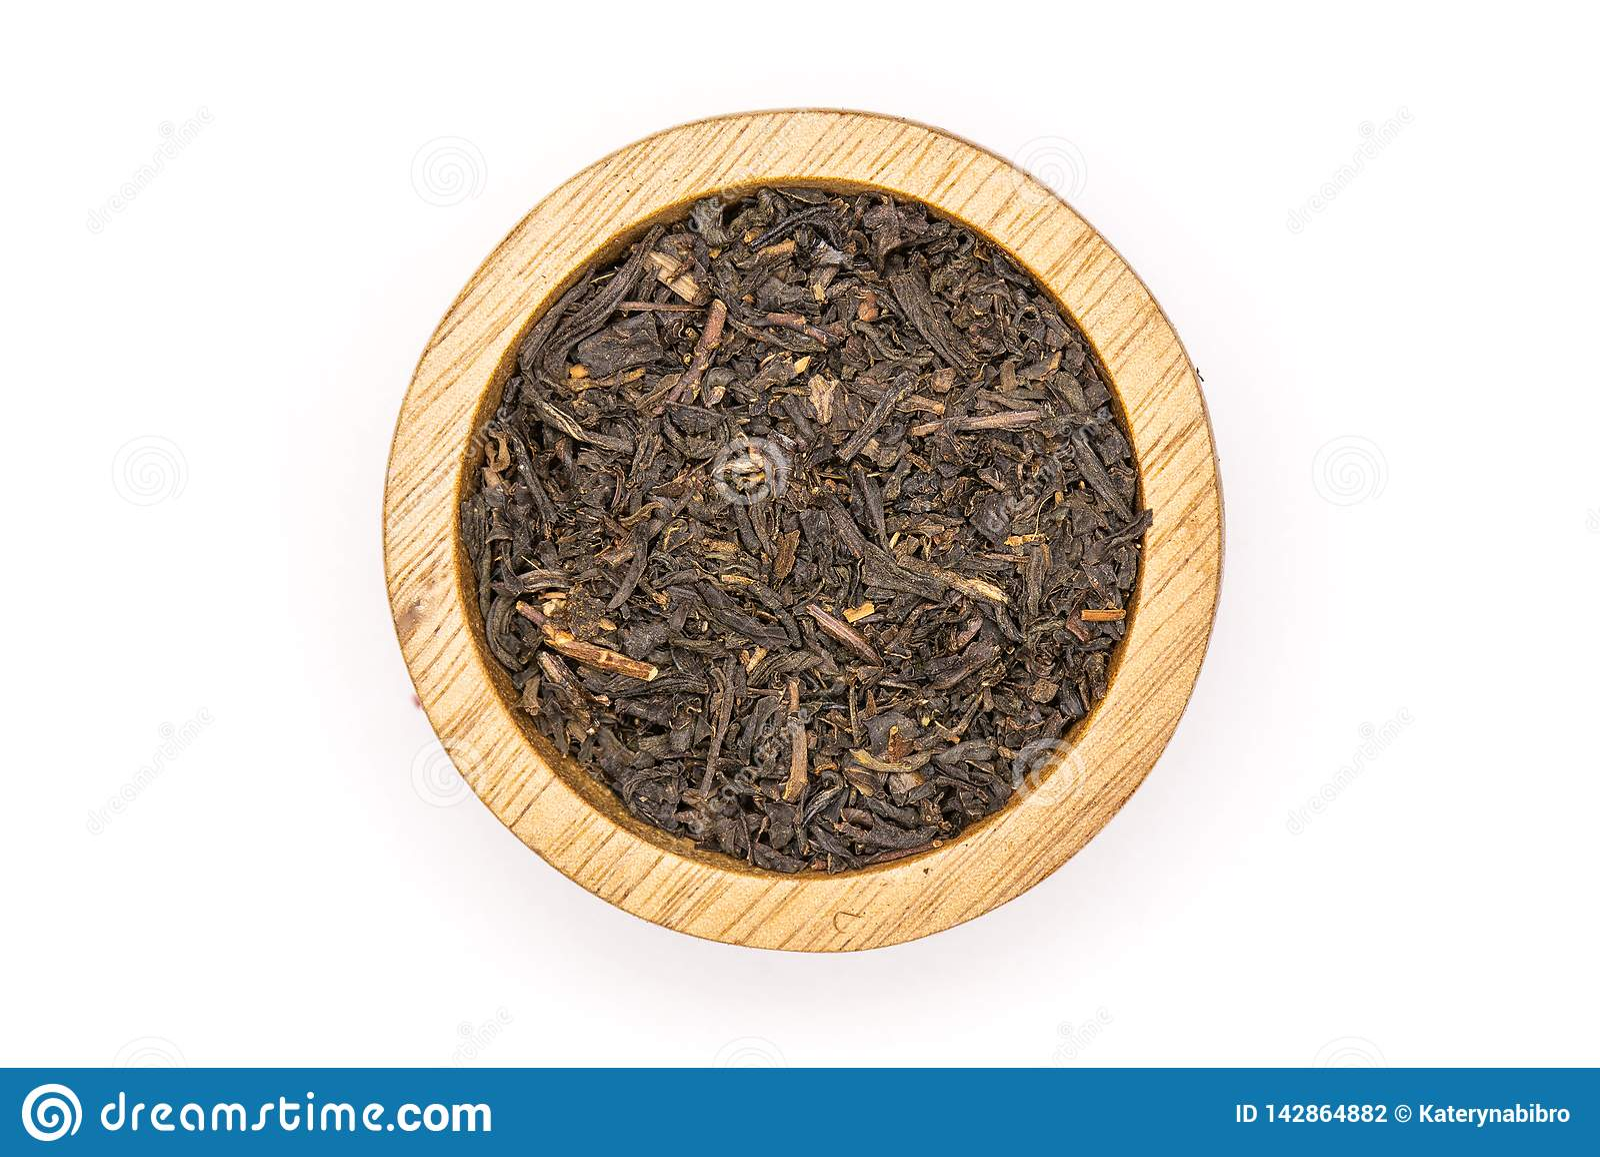 Black tea earl grey isolated on white